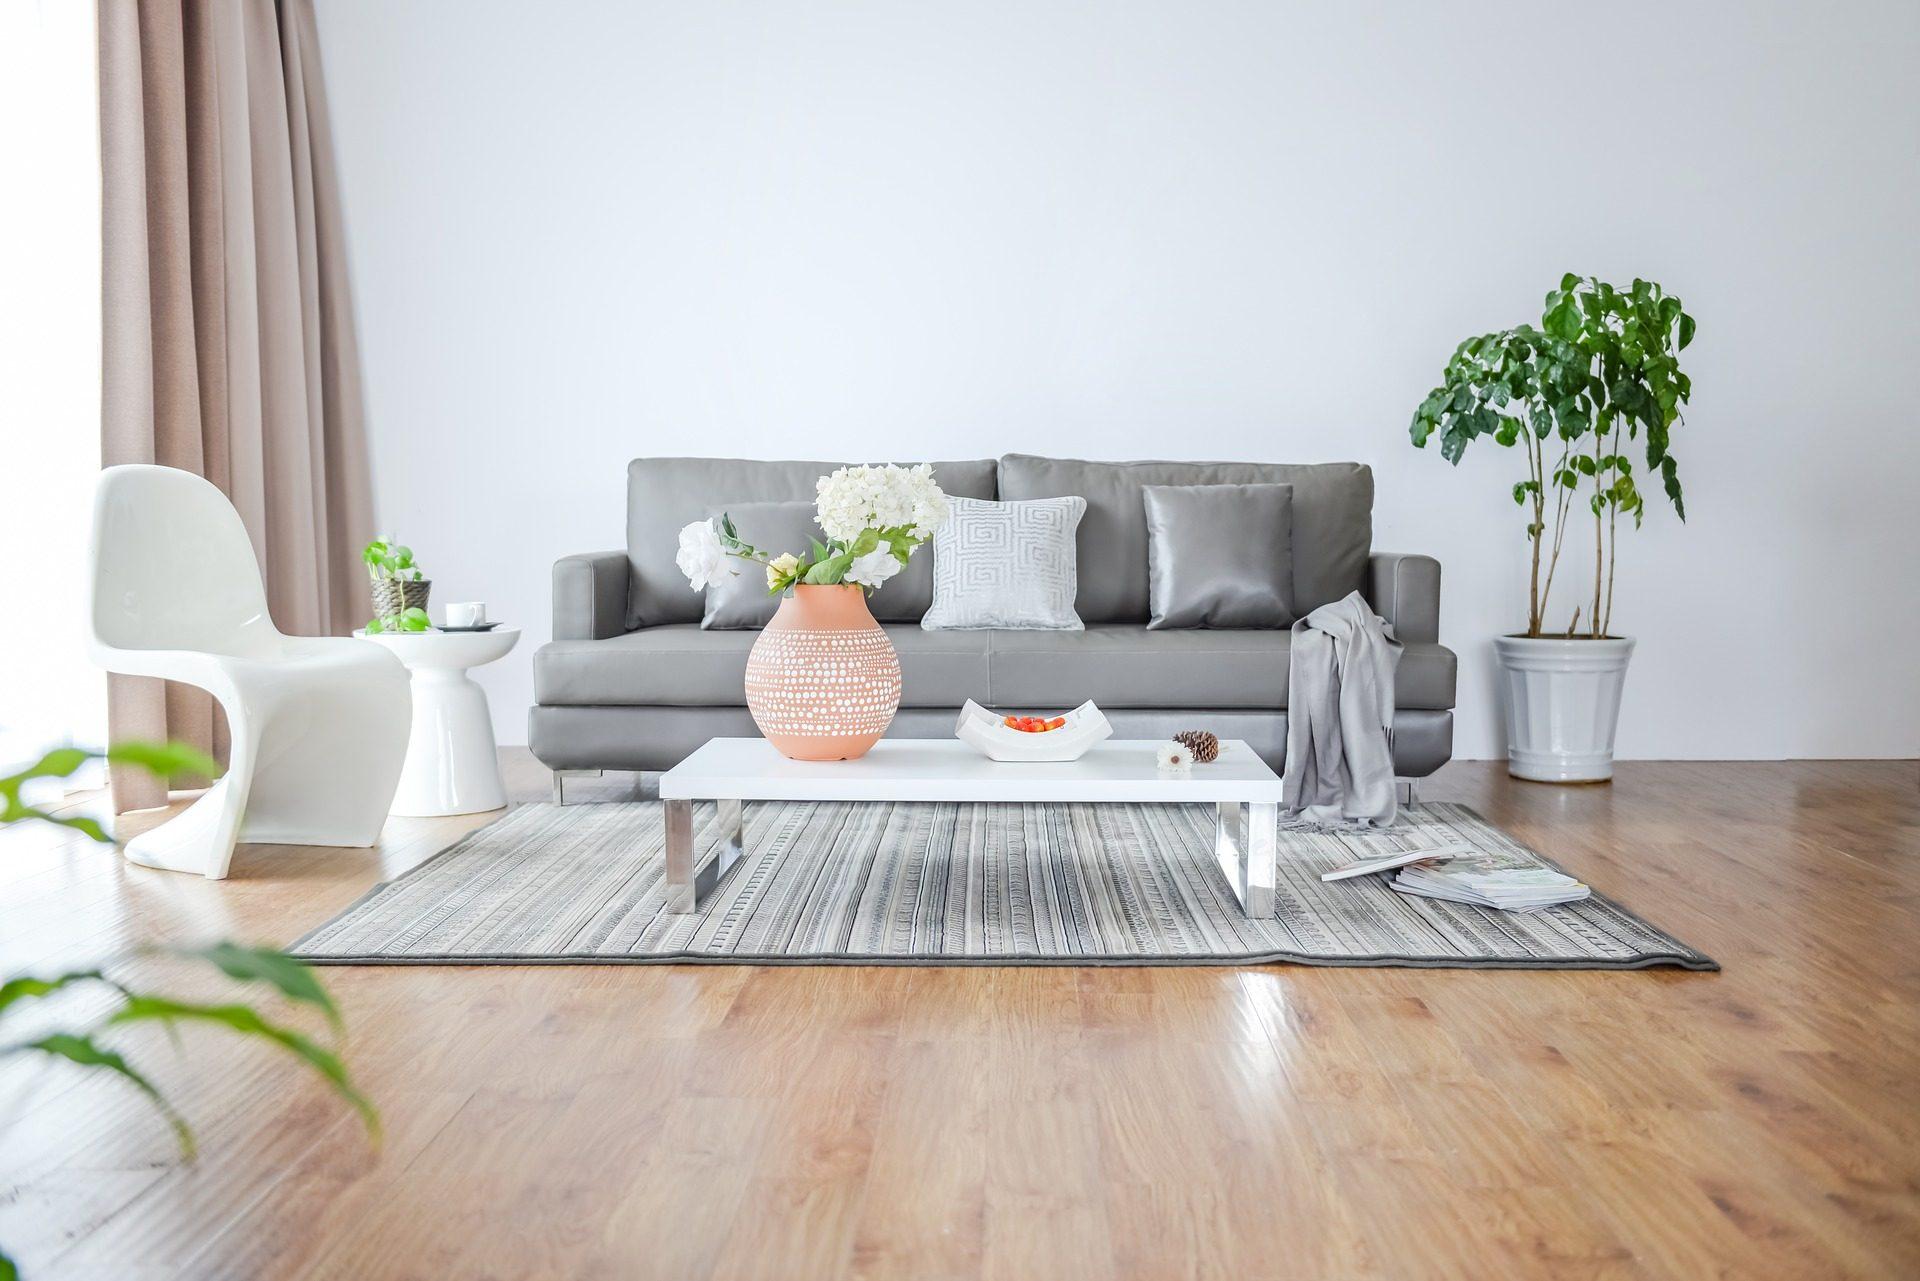 Fondo de pantalla de sal n estancia sof silla mesa for Minimalismus im haushalt